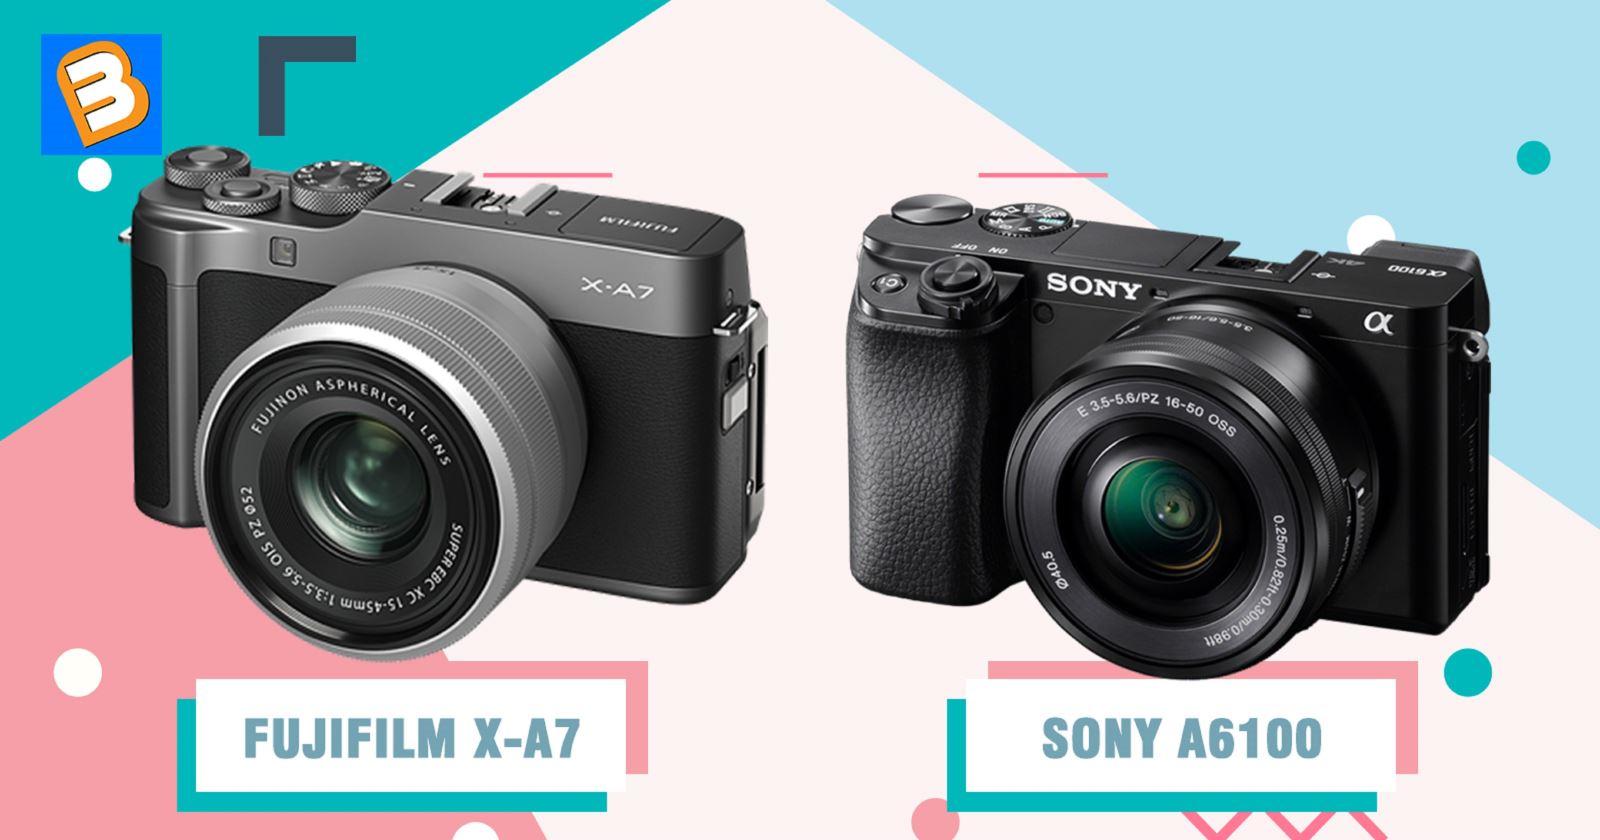 So sánh Fujifilm X-A7 vớiSony A6100